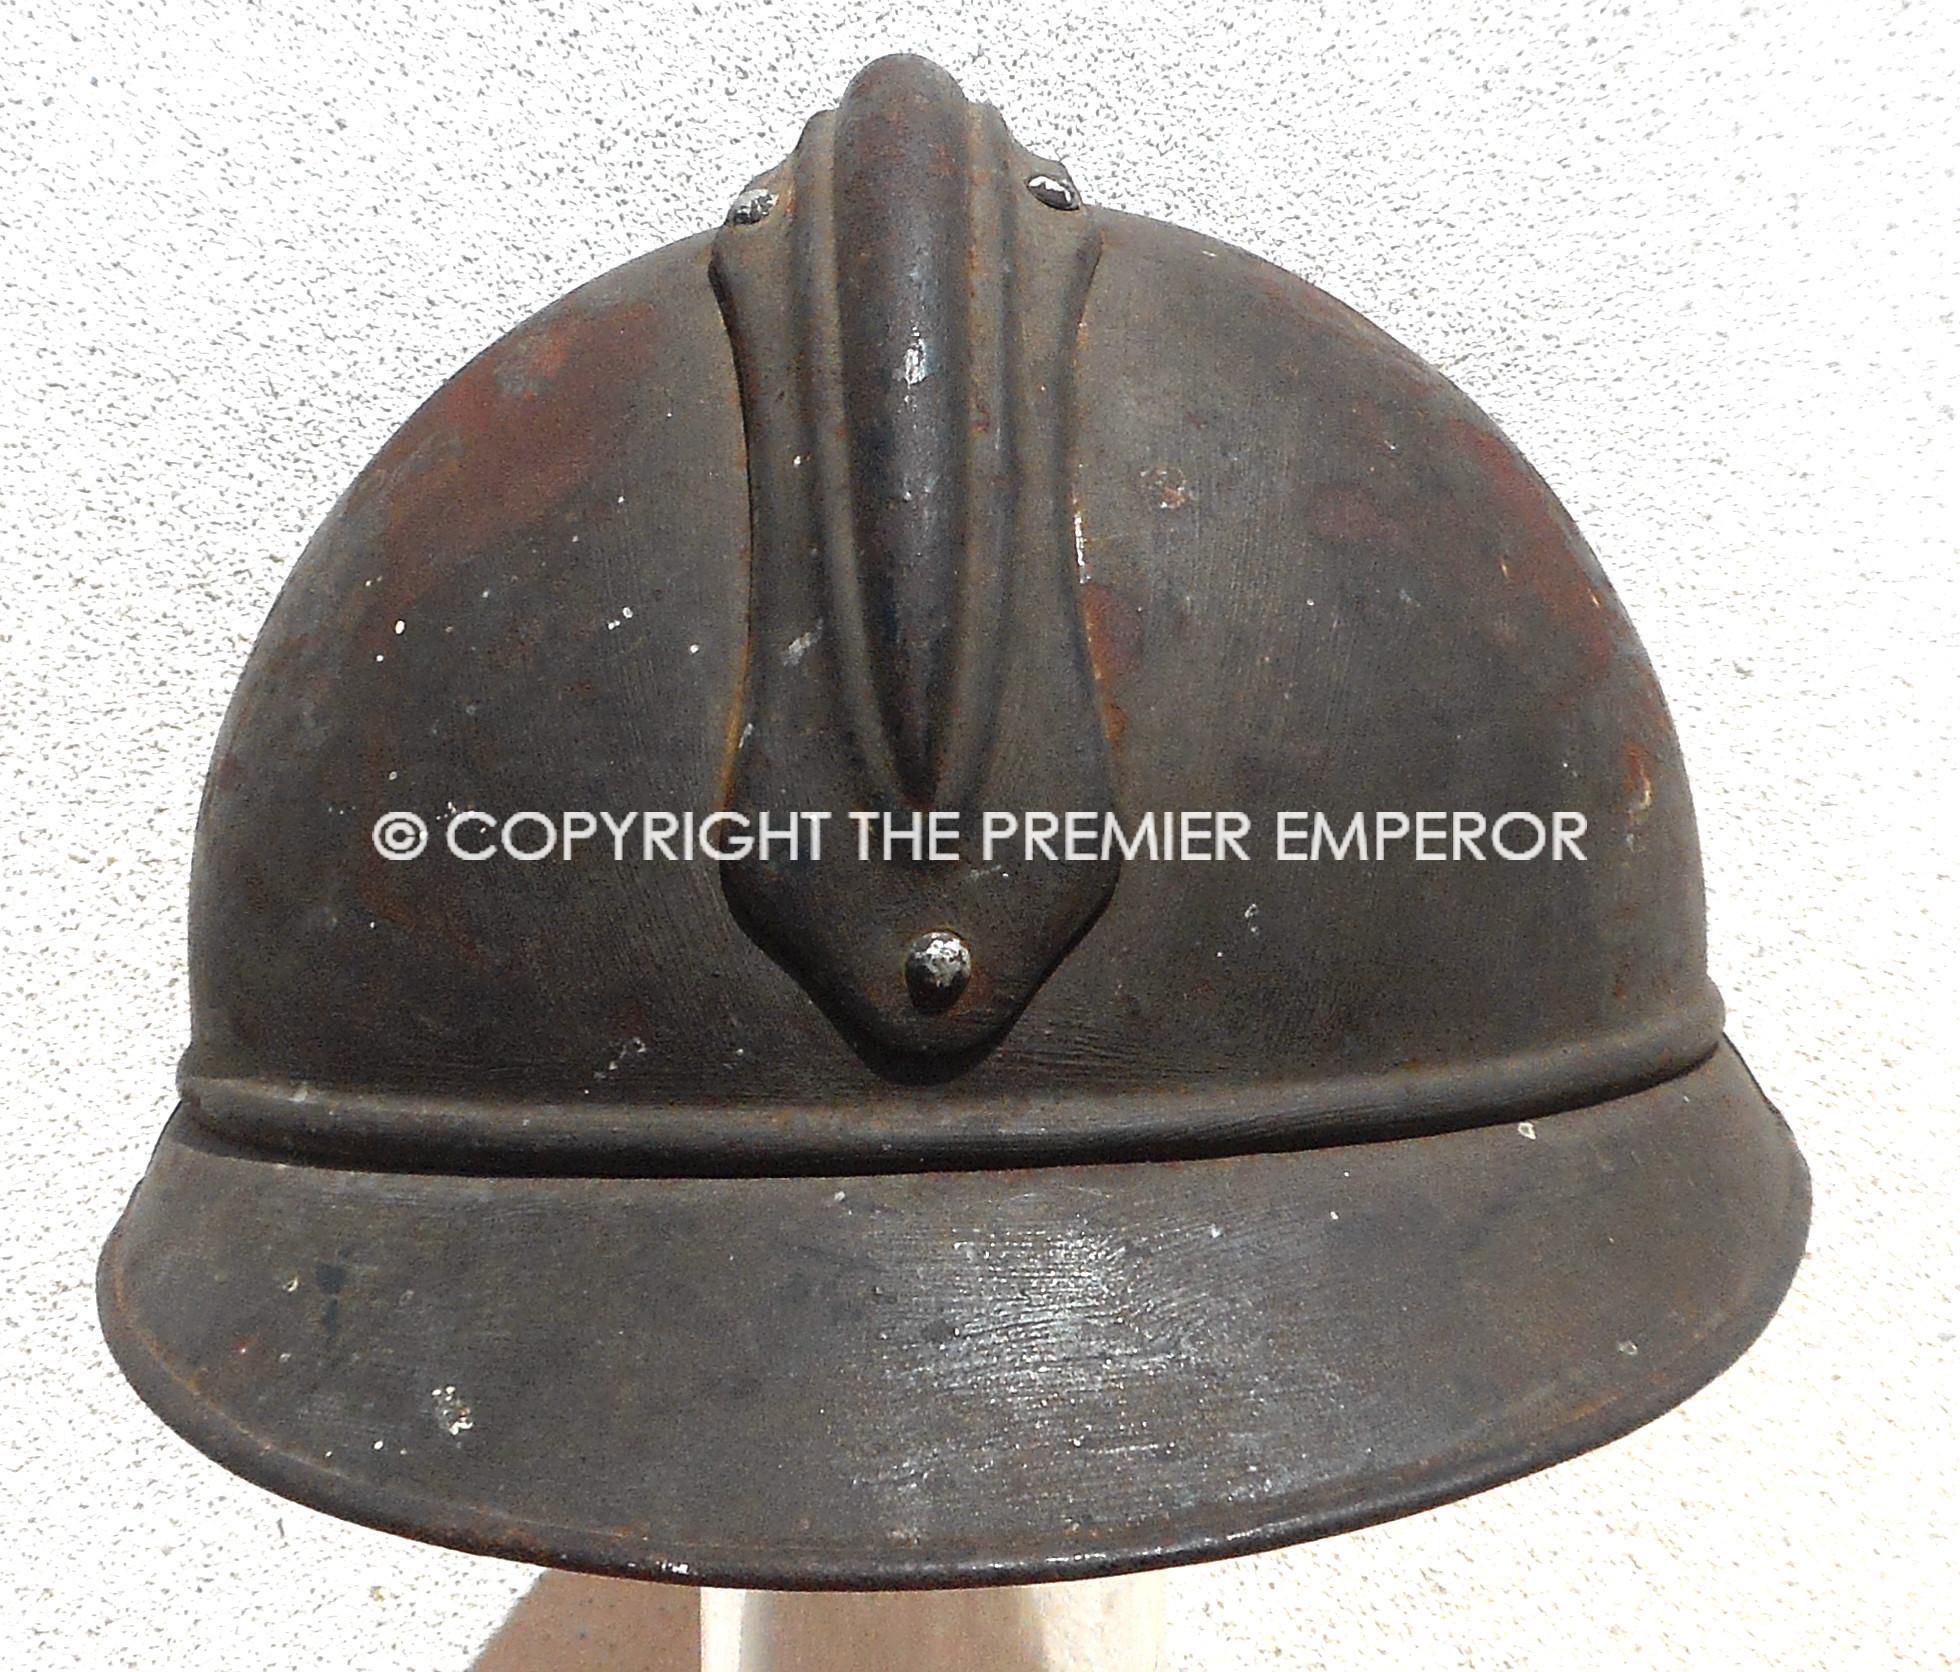 Nozzle cleaning tool unc veterans 14-18 adrian helmet